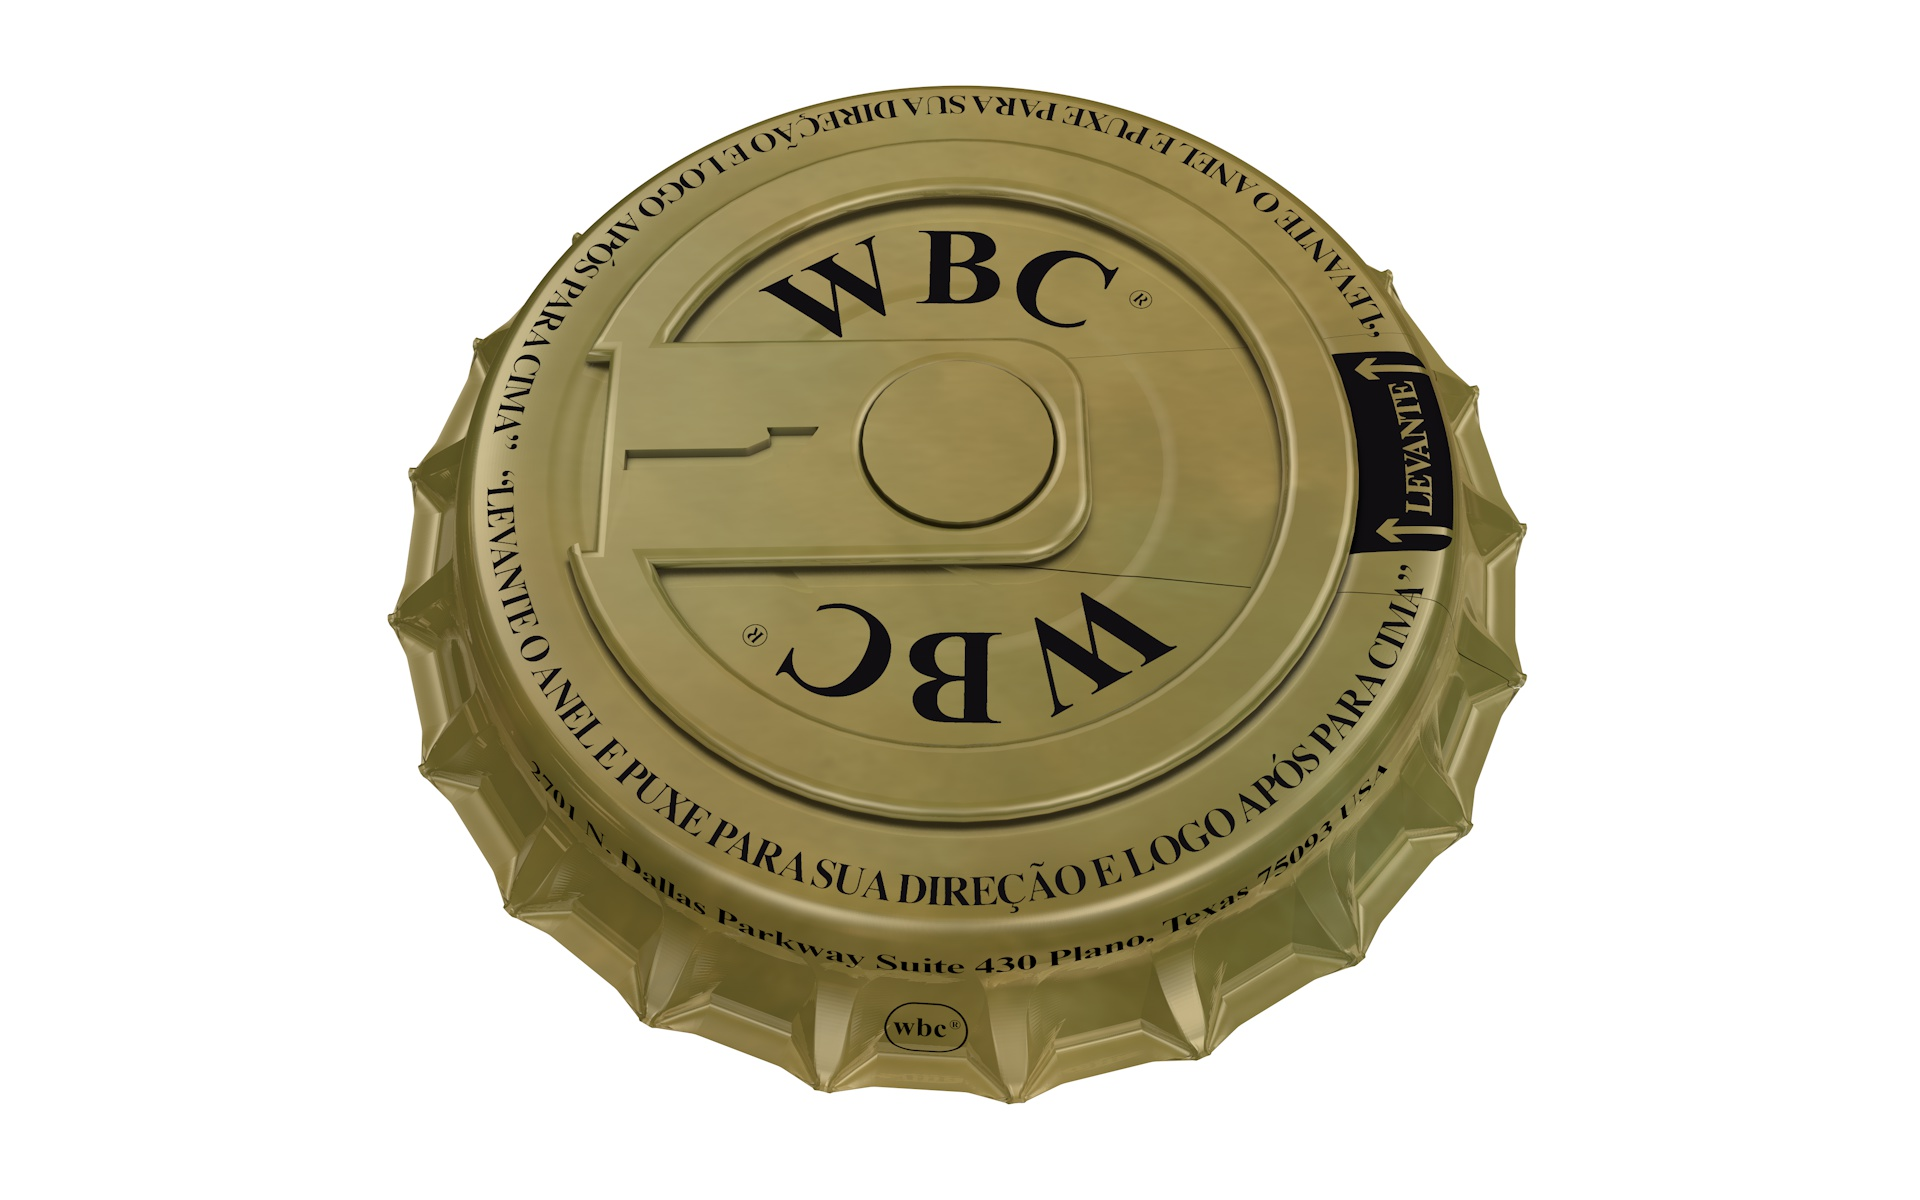 epbc-wbc-lift-ar-por-002_0000